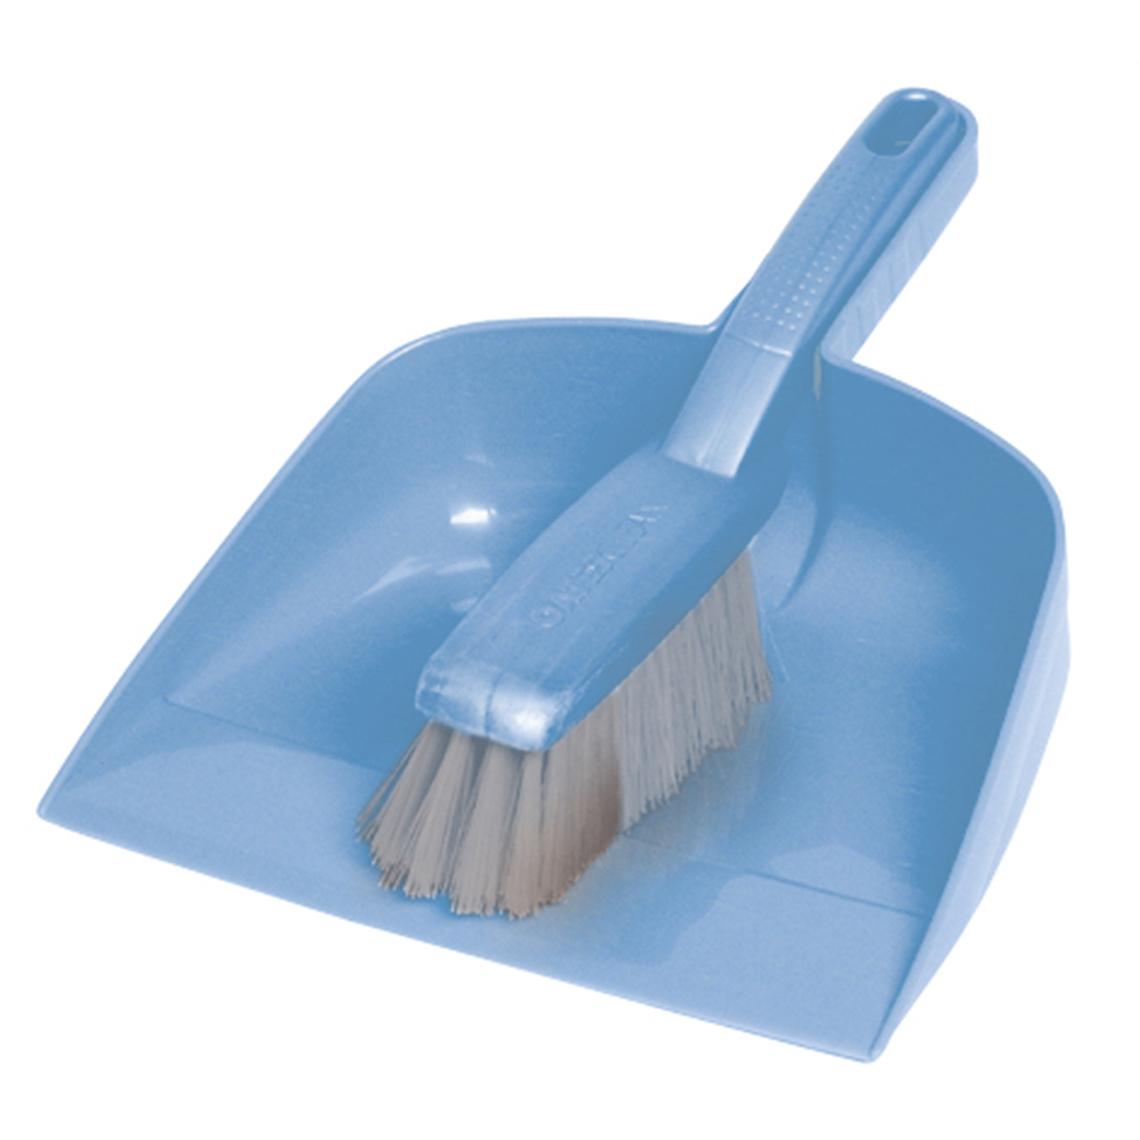 Ultimate Dustpan Set